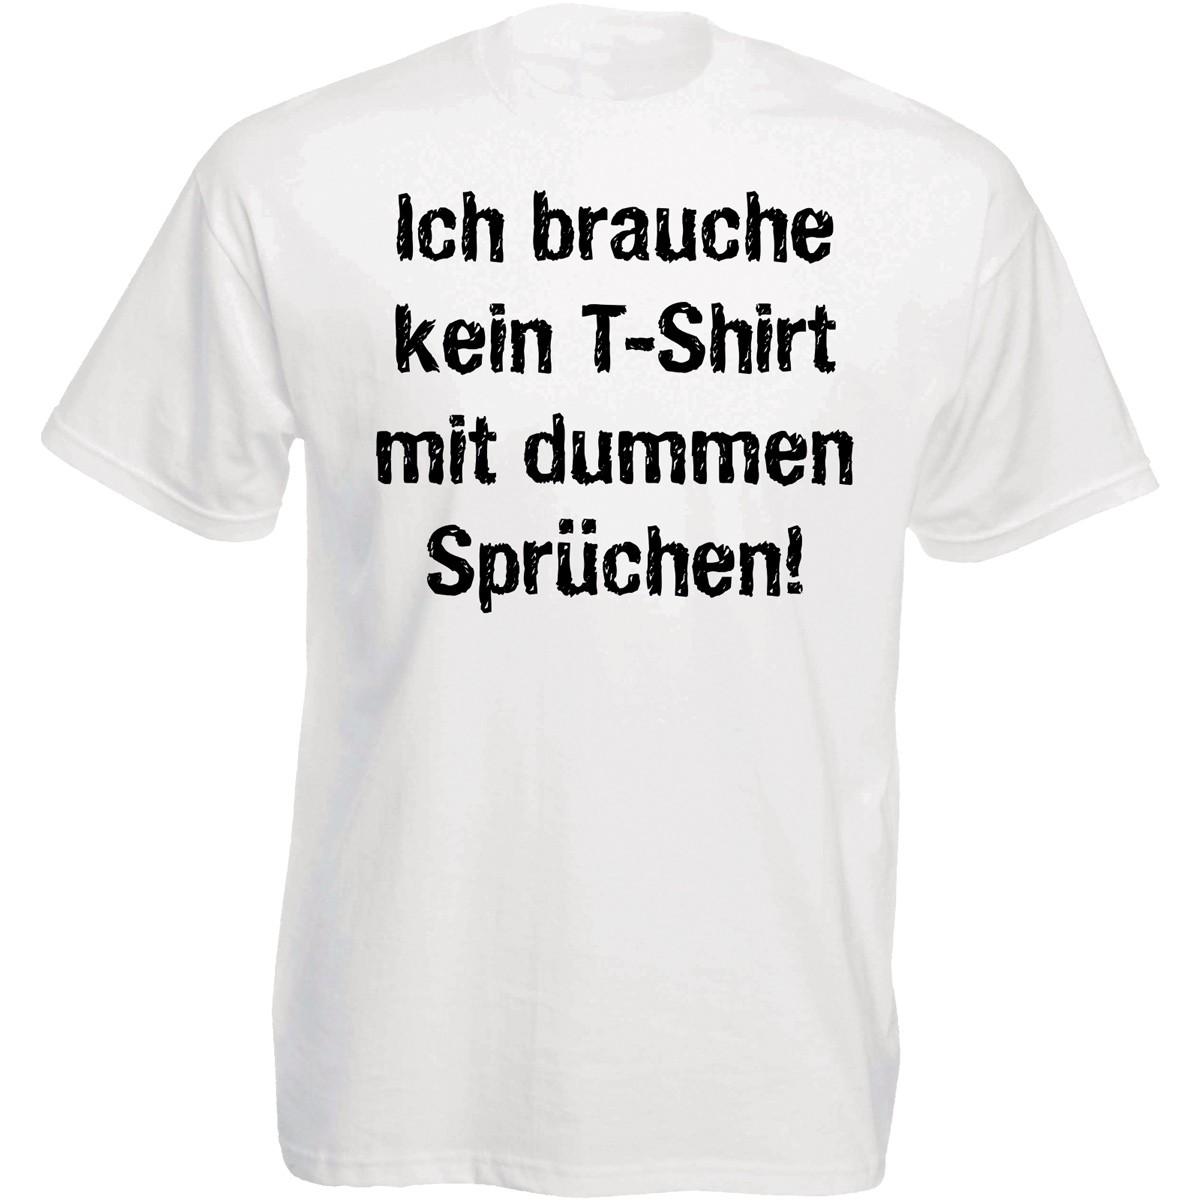 Full Size of Fitness Sprüche T Shirt Sprüche T Shirt Angeln Sächsische Sprüche T Shirt Festival Sprüche T Shirt Küche Sprüche T Shirt